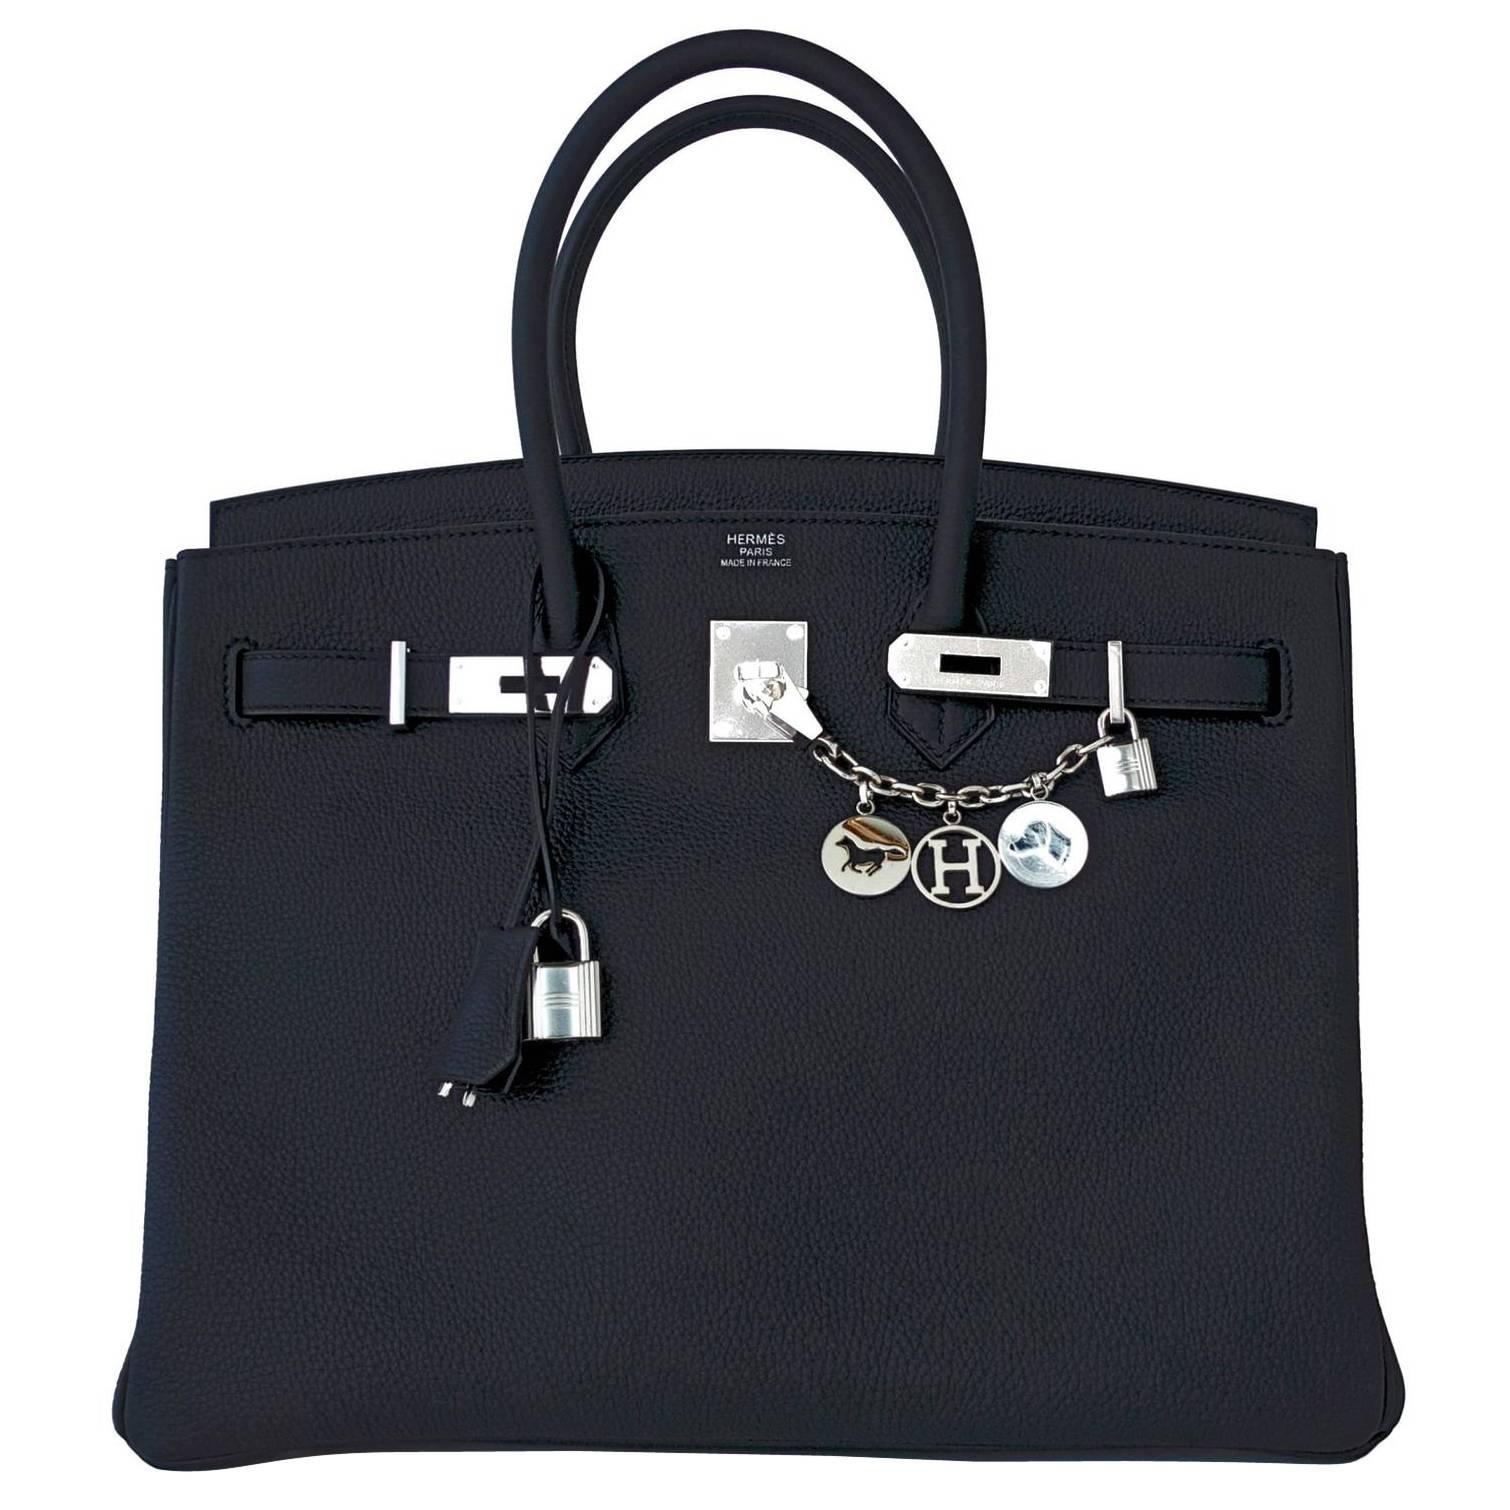 13f5f3523dac Hermes Birkin 25cm Black Togo Gold Hardware C Stamp Birkin Bag